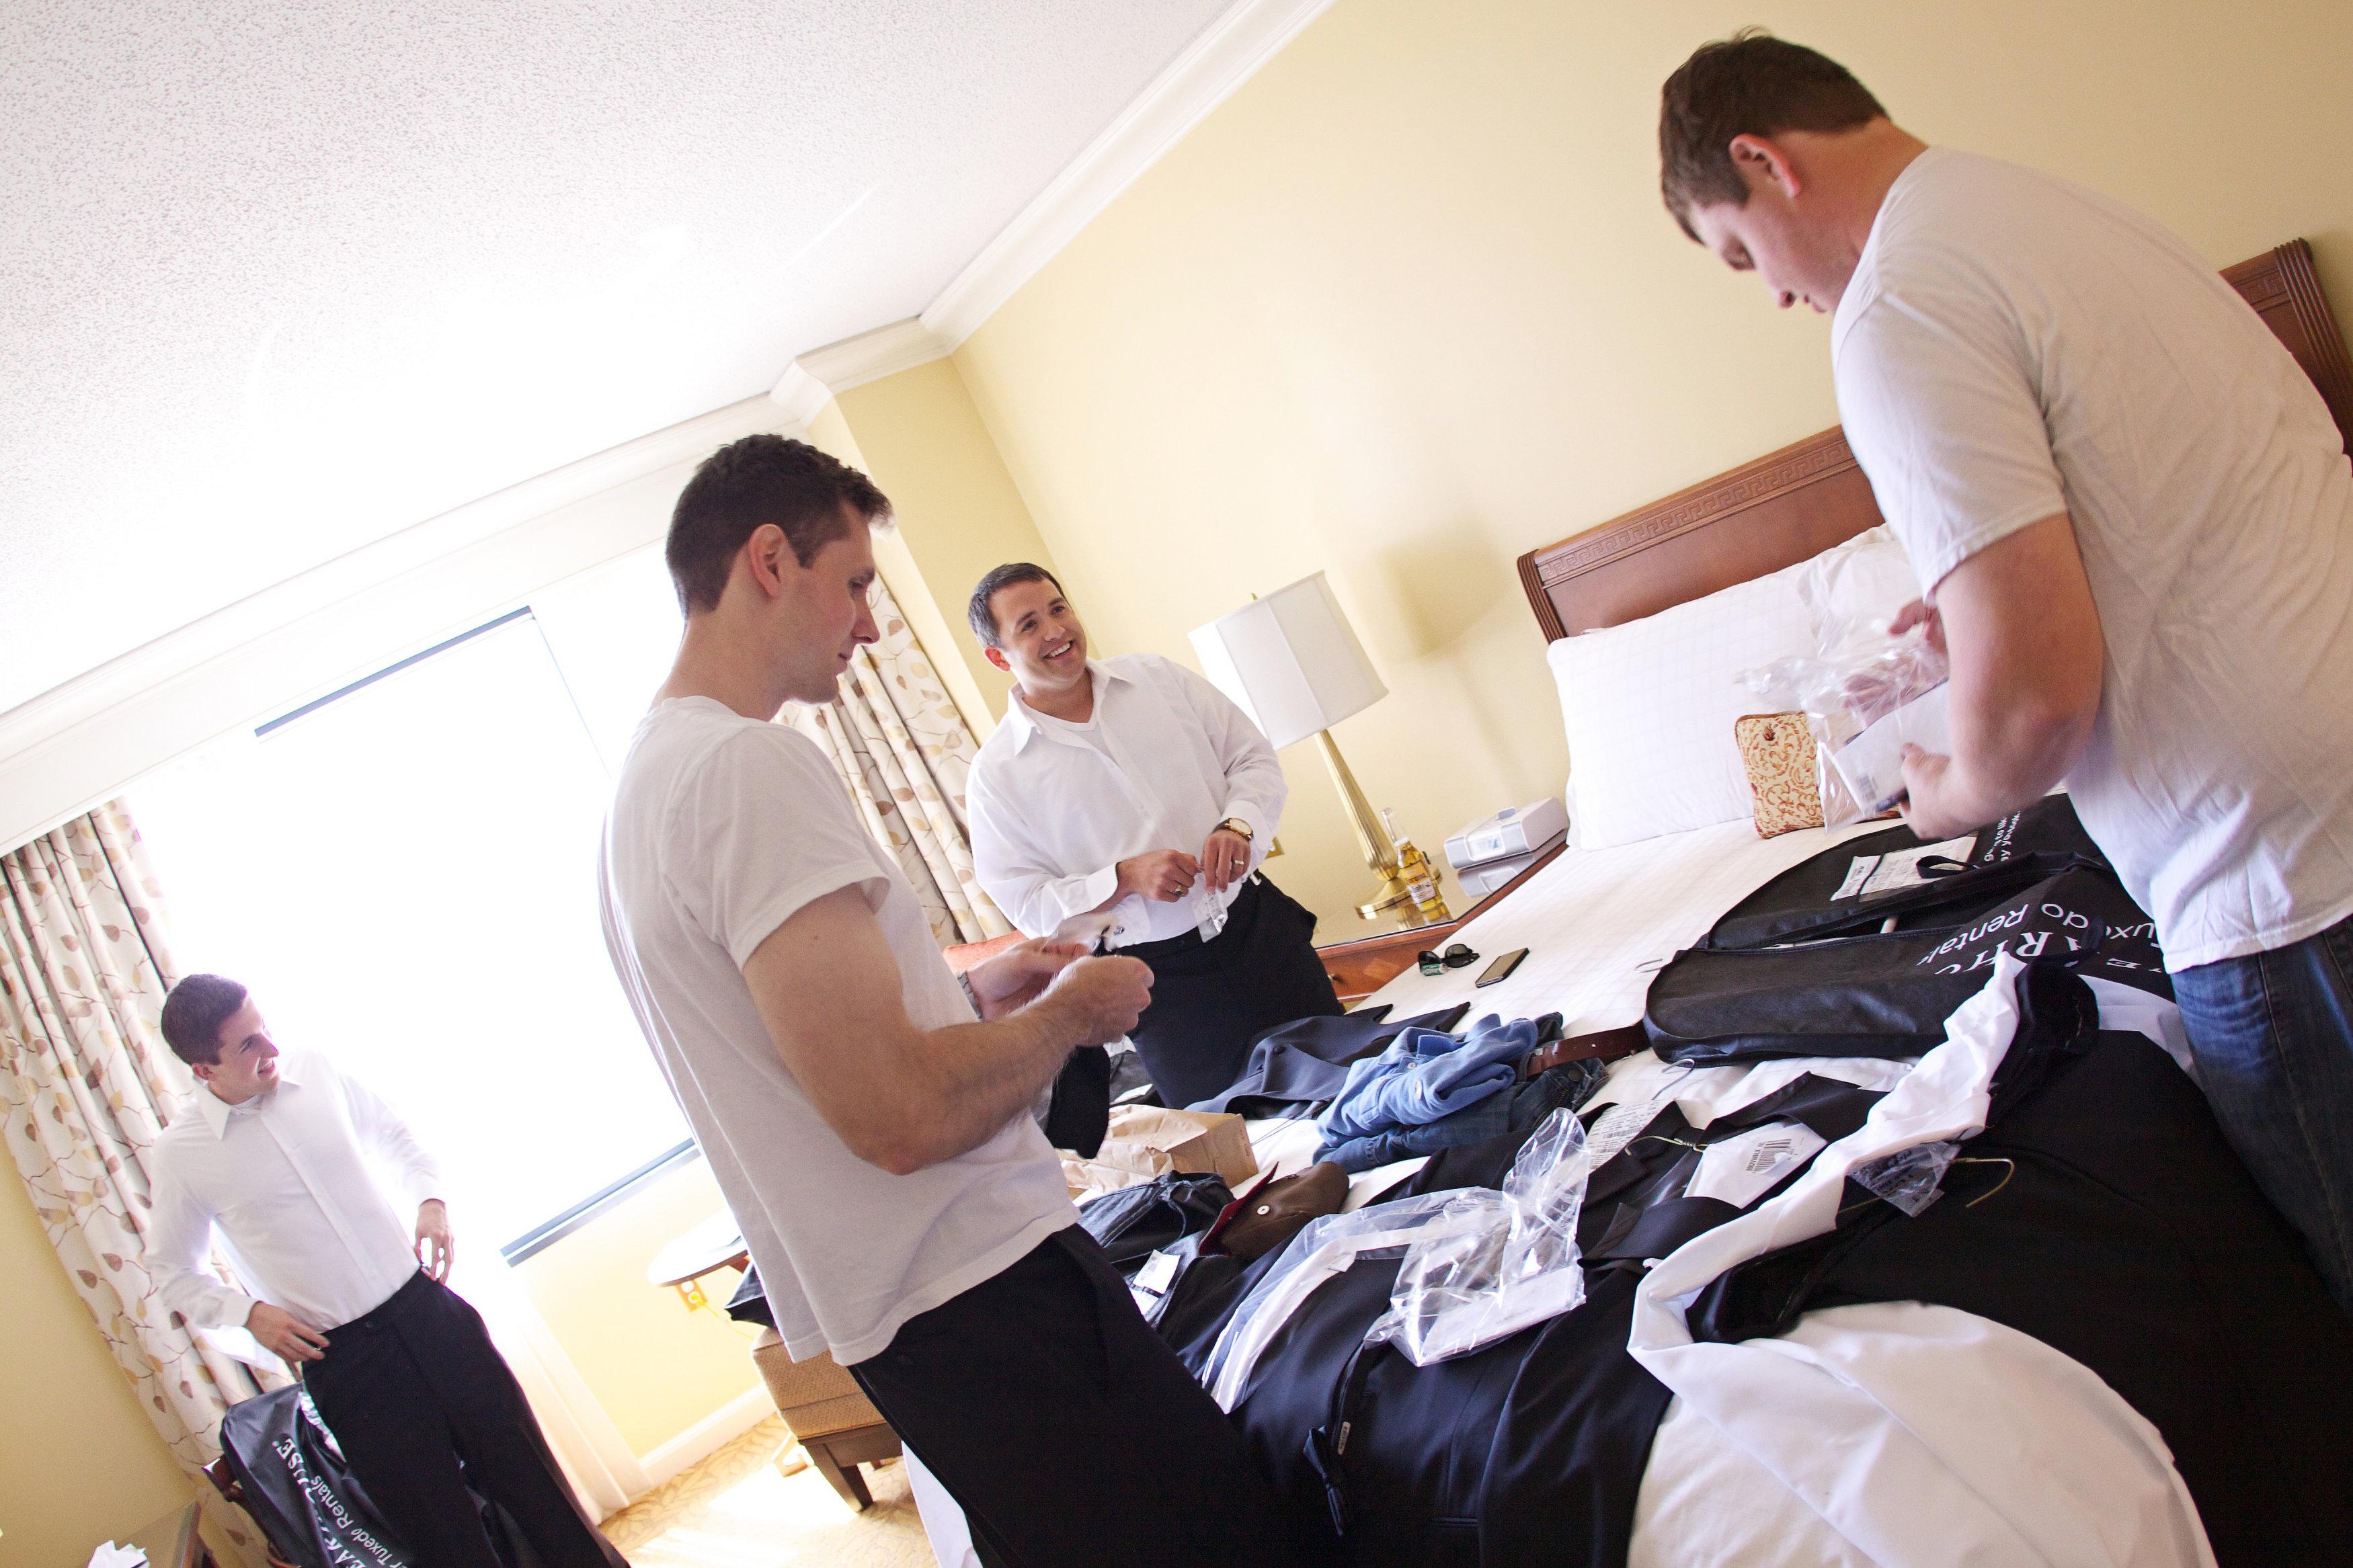 Guys getting ready